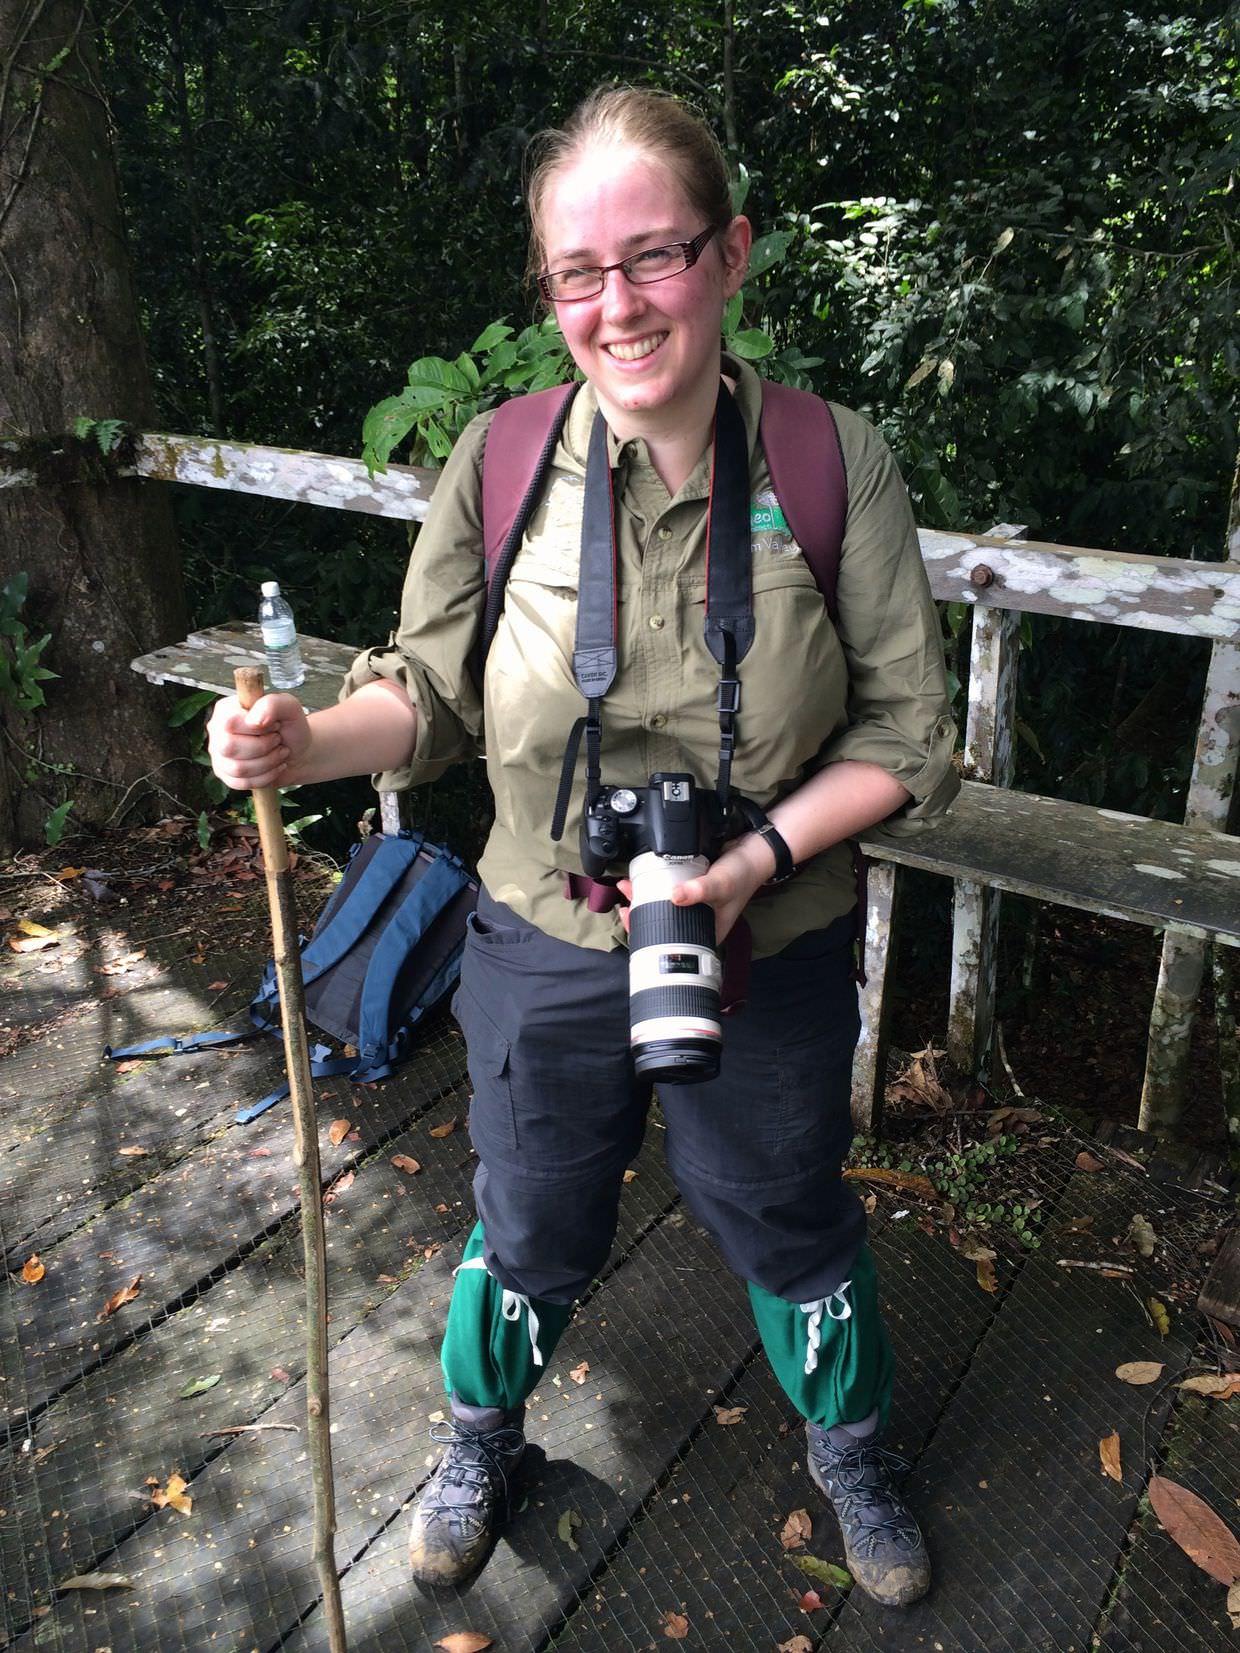 Samantha in full jungle trekking gear